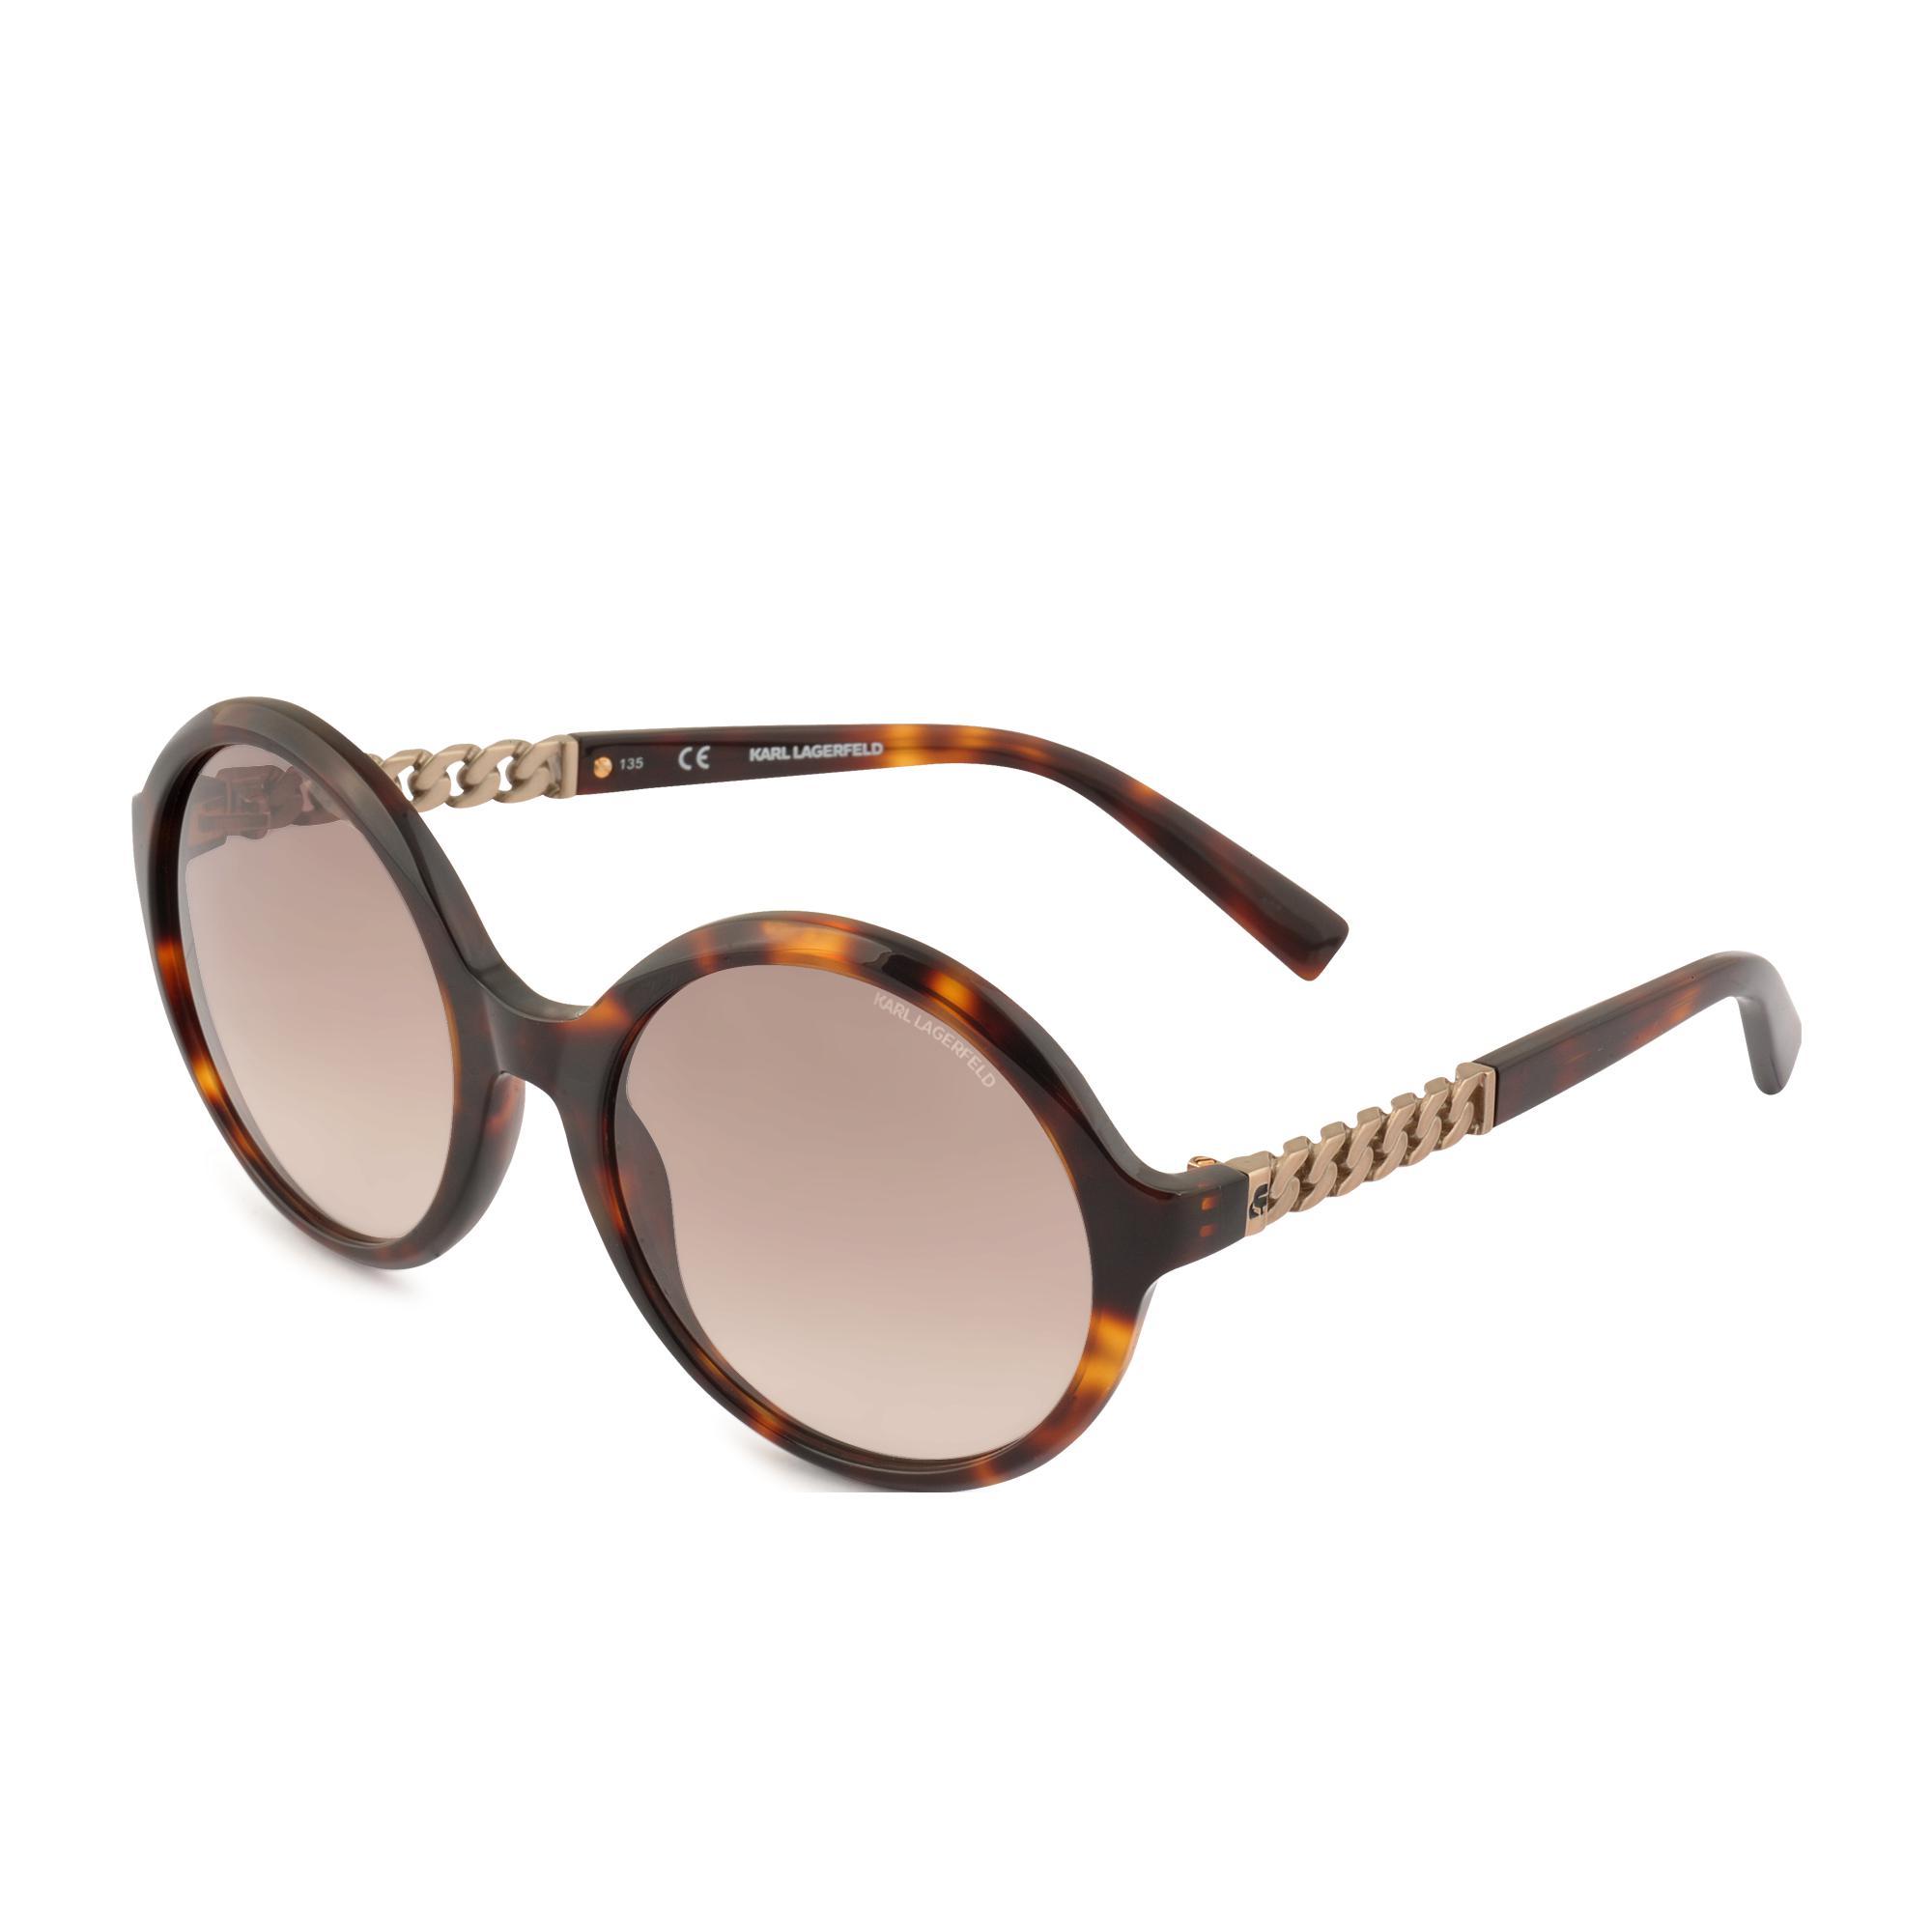 aaa34fccf65 Lyst - Karl Lagerfeld Kl842s Sunglasses in Brown